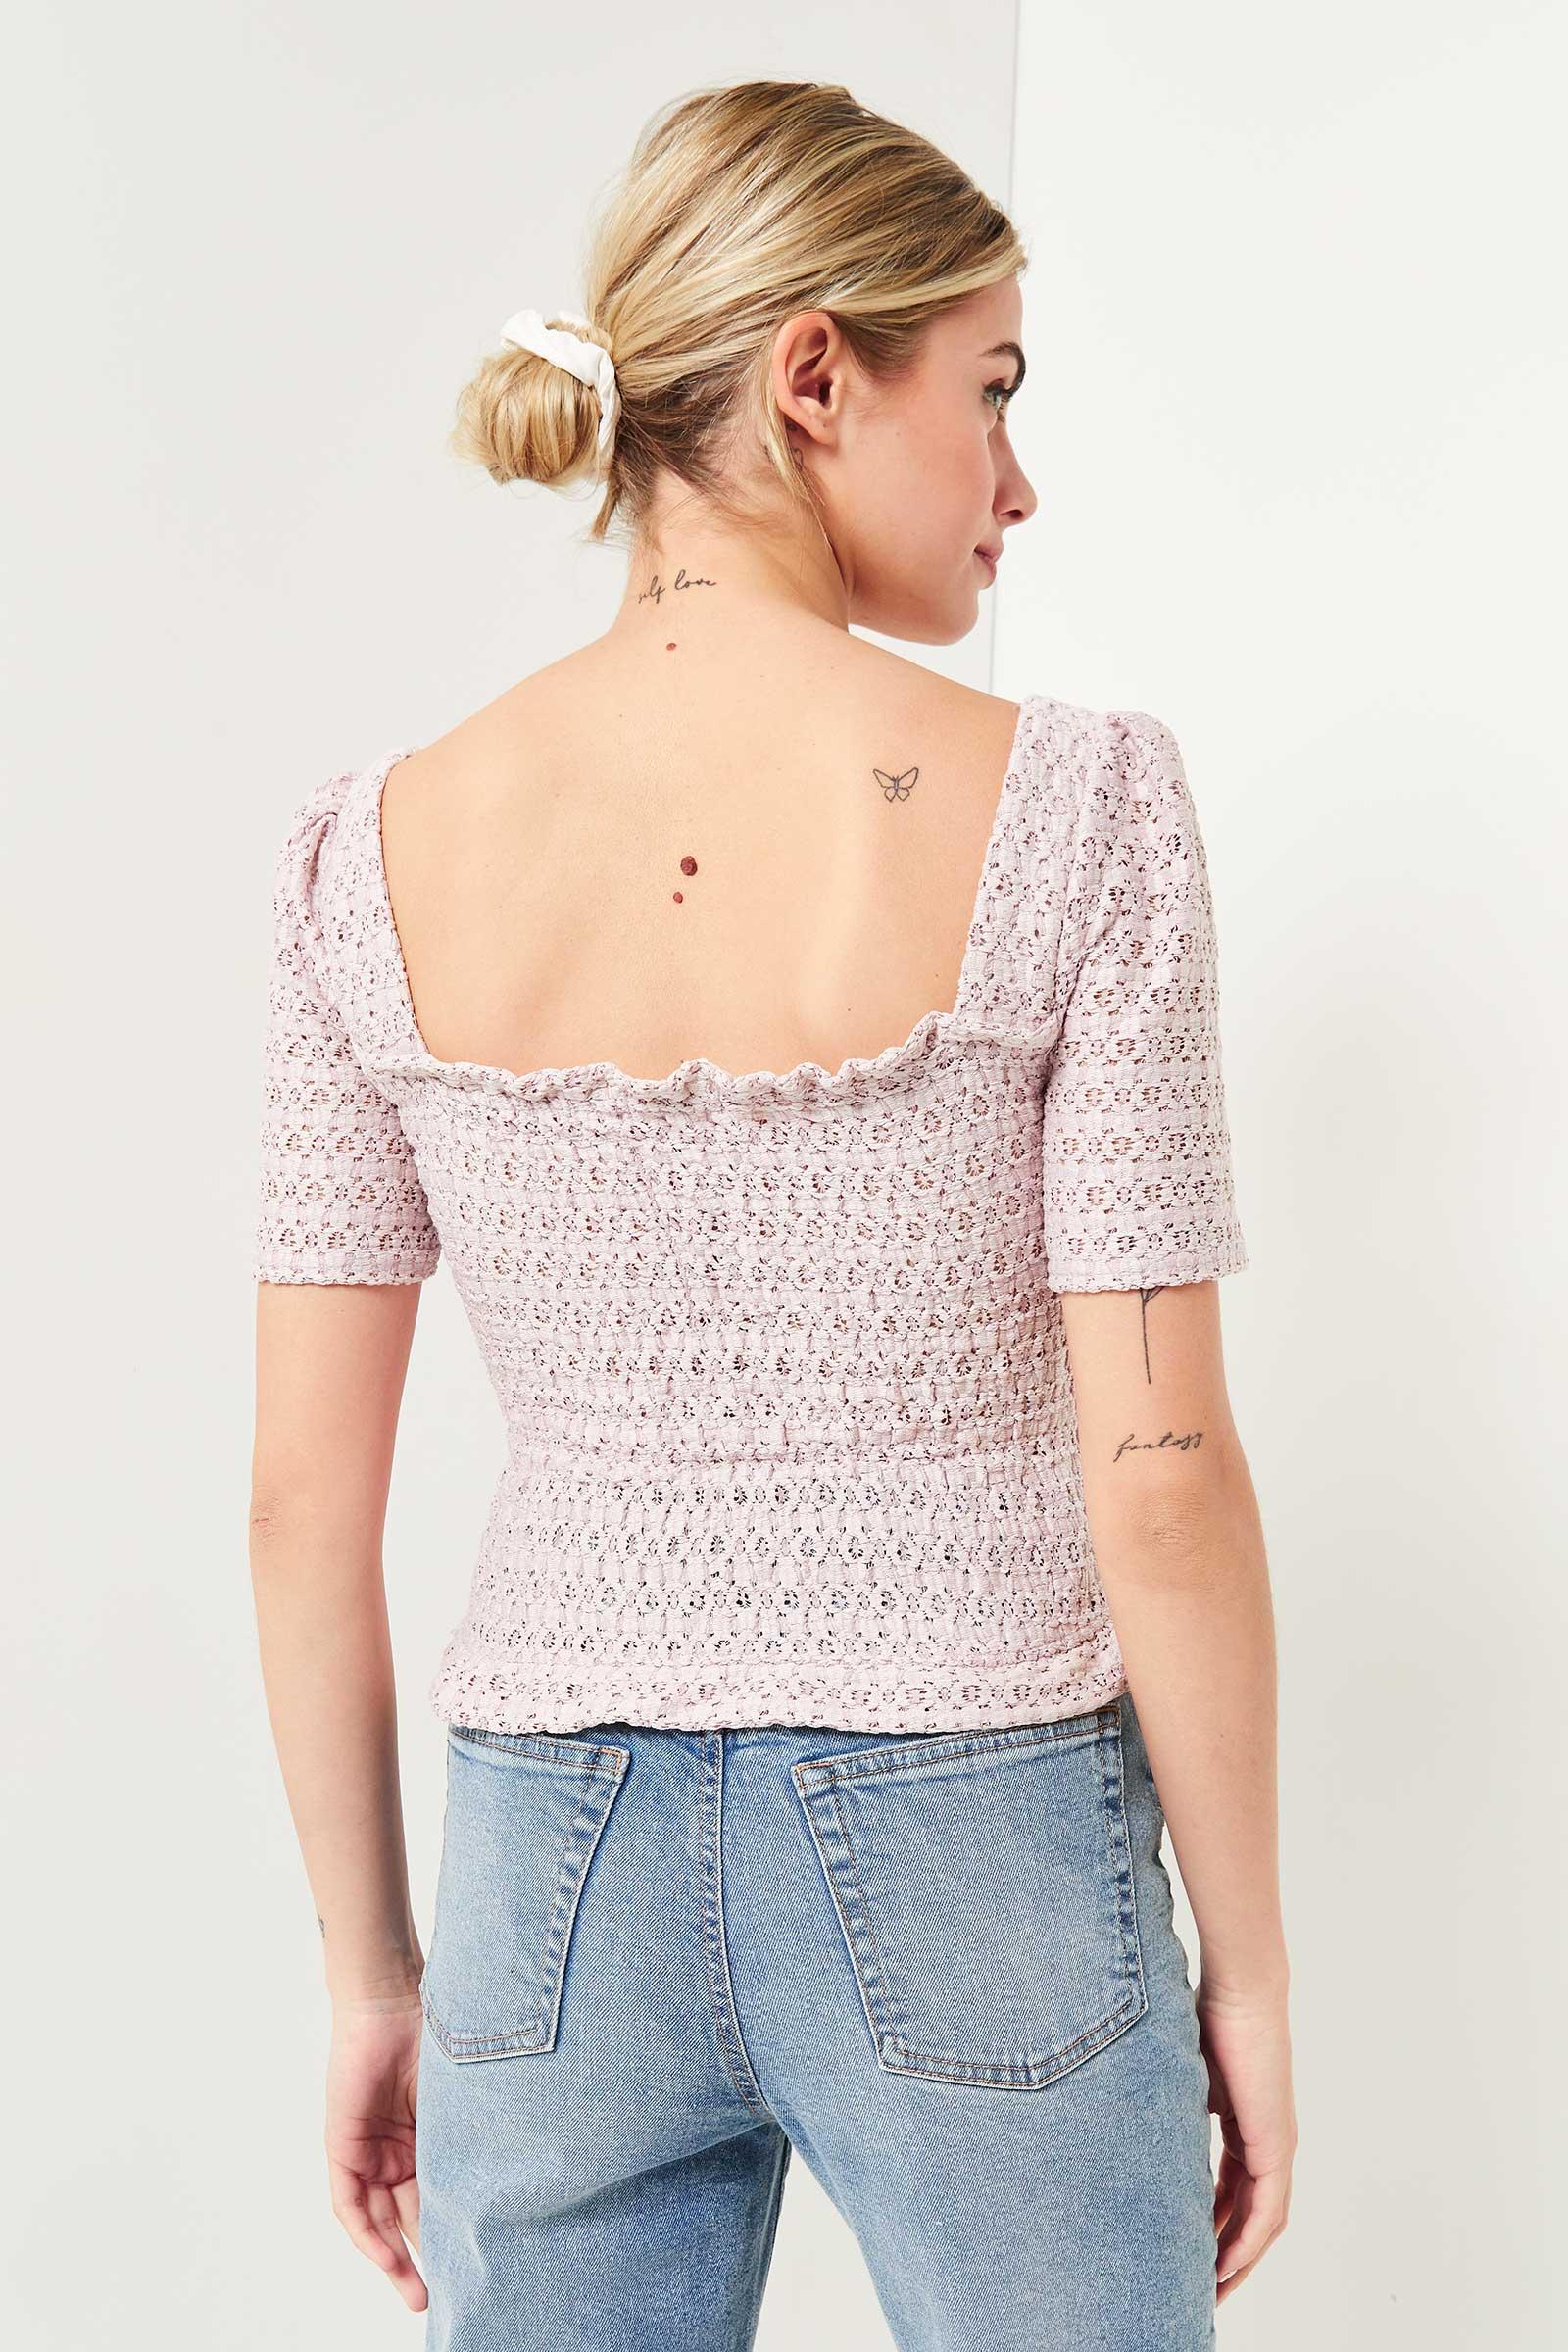 Crochet Crop Top with Balloon Sleeve